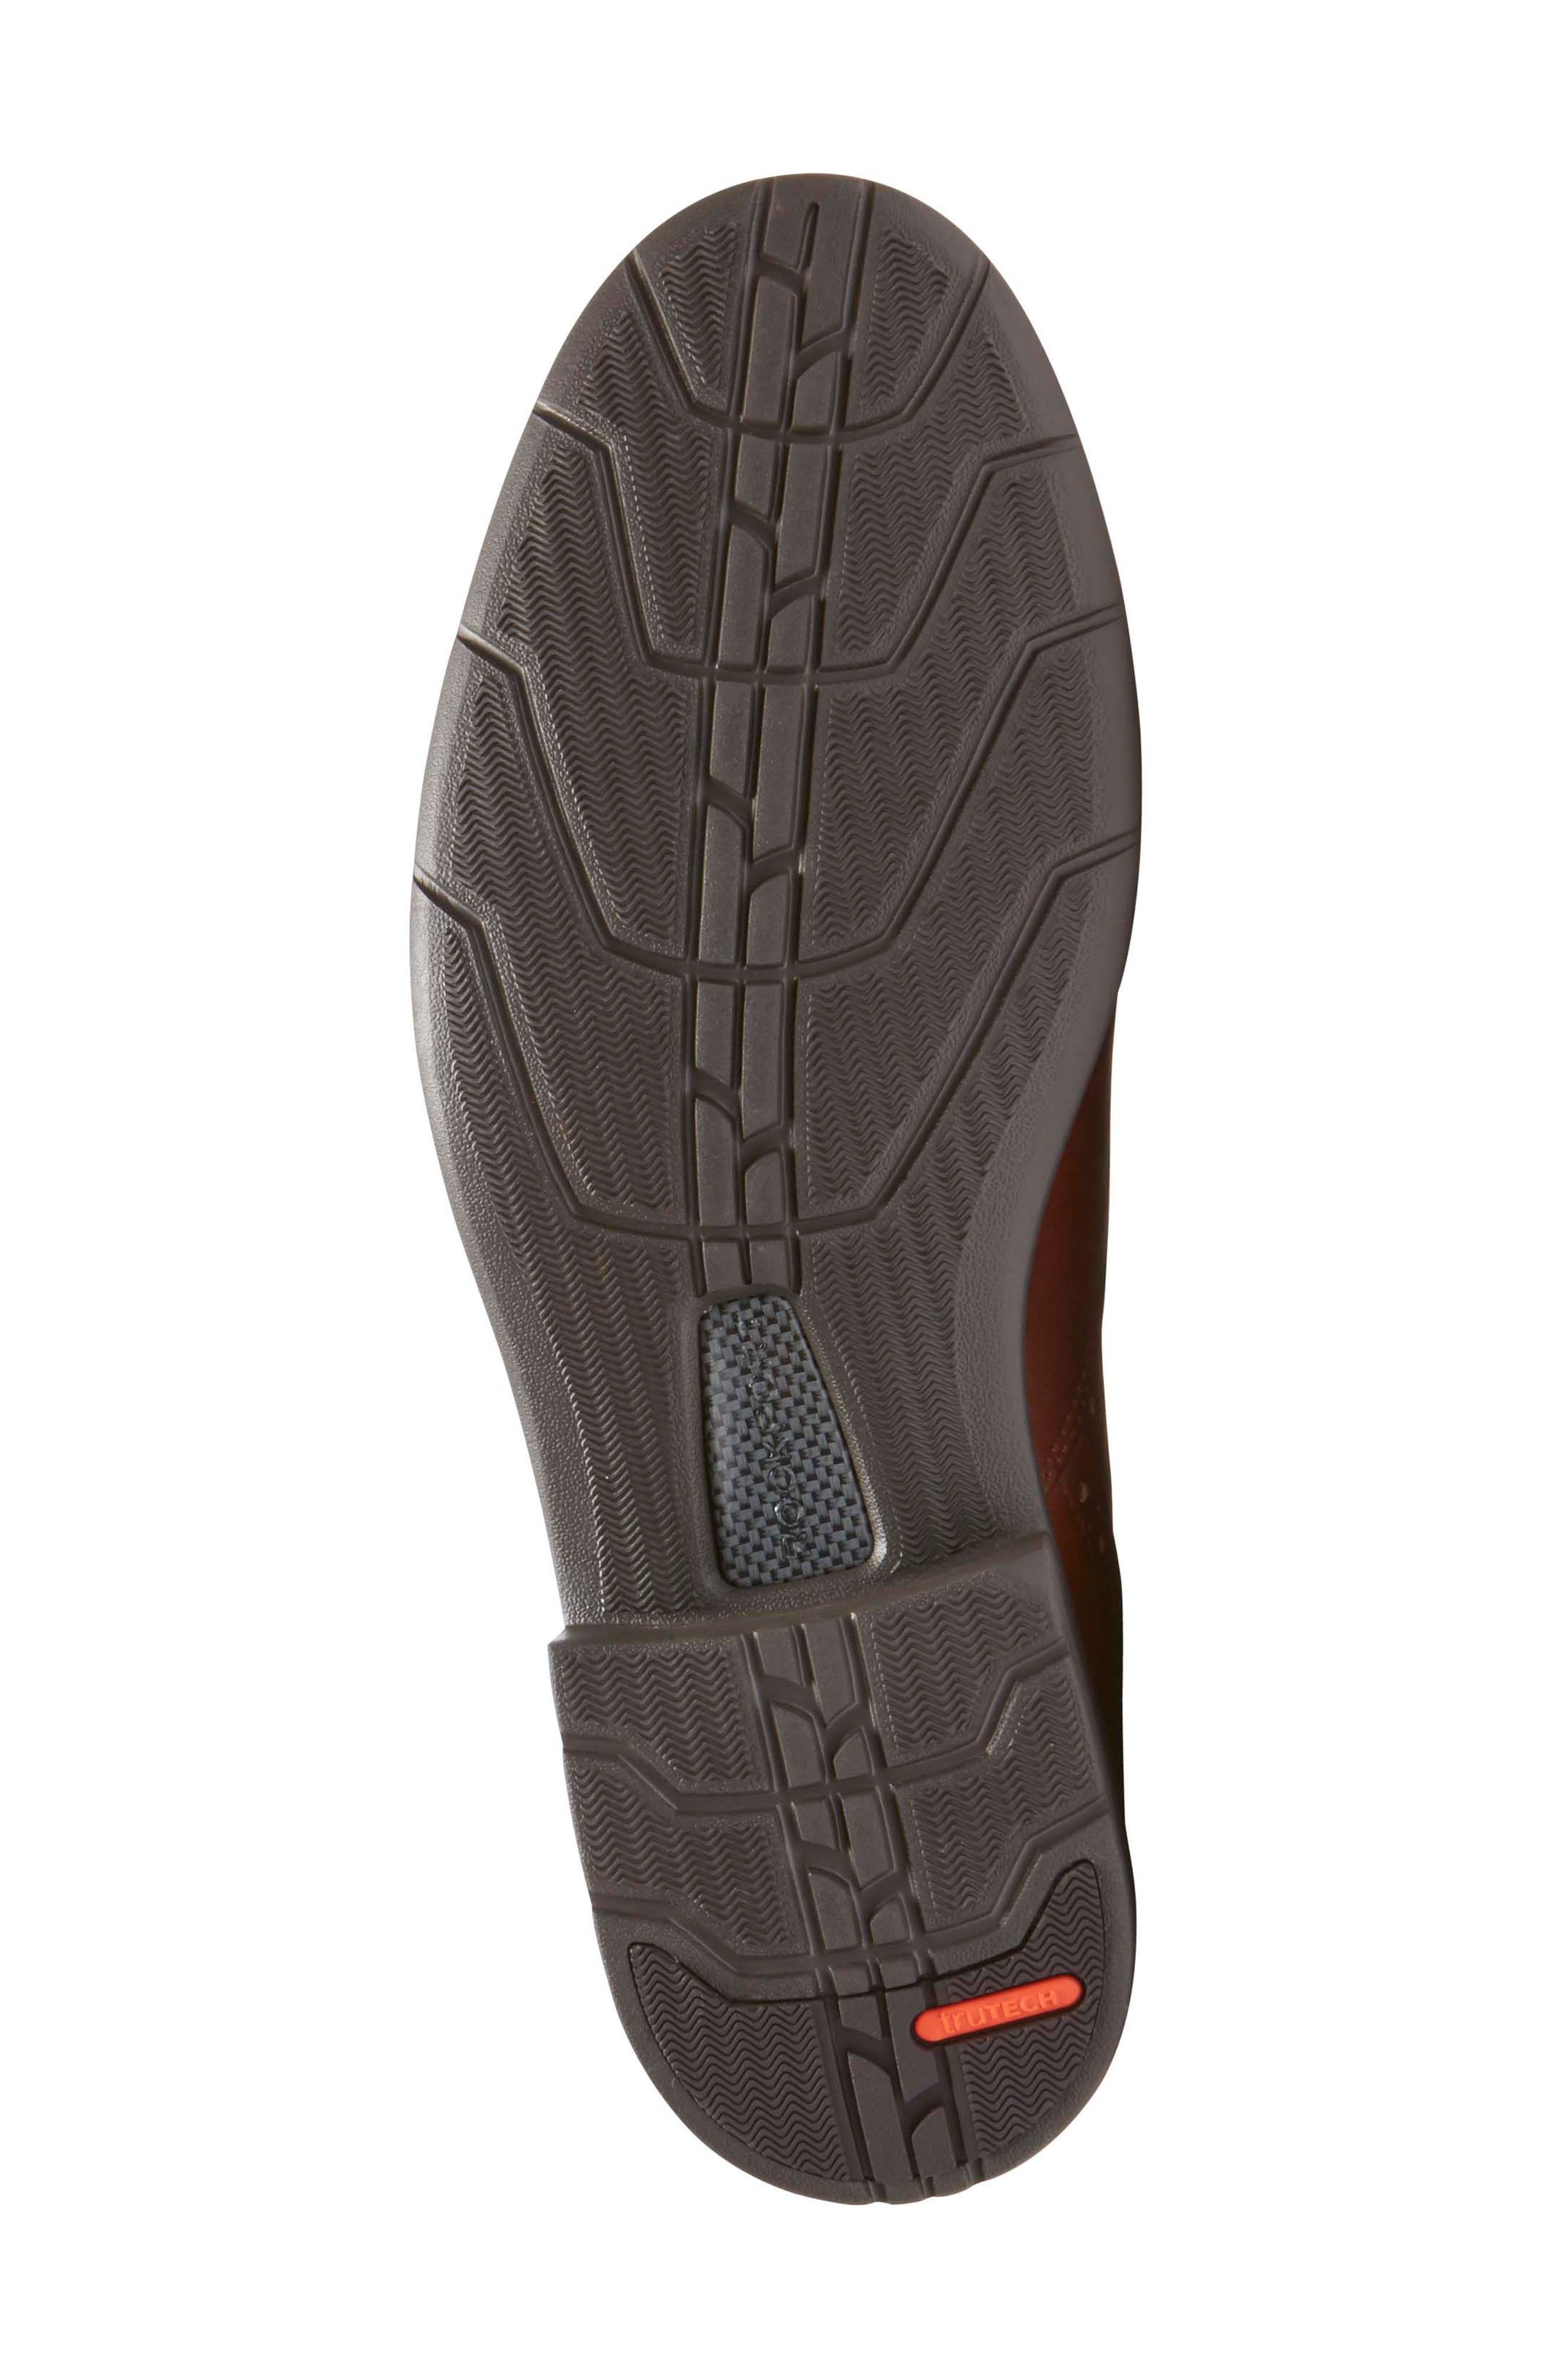 Total Motion Classic Dress Venetian Loafer,                             Alternate thumbnail 6, color,                             Tan Leather